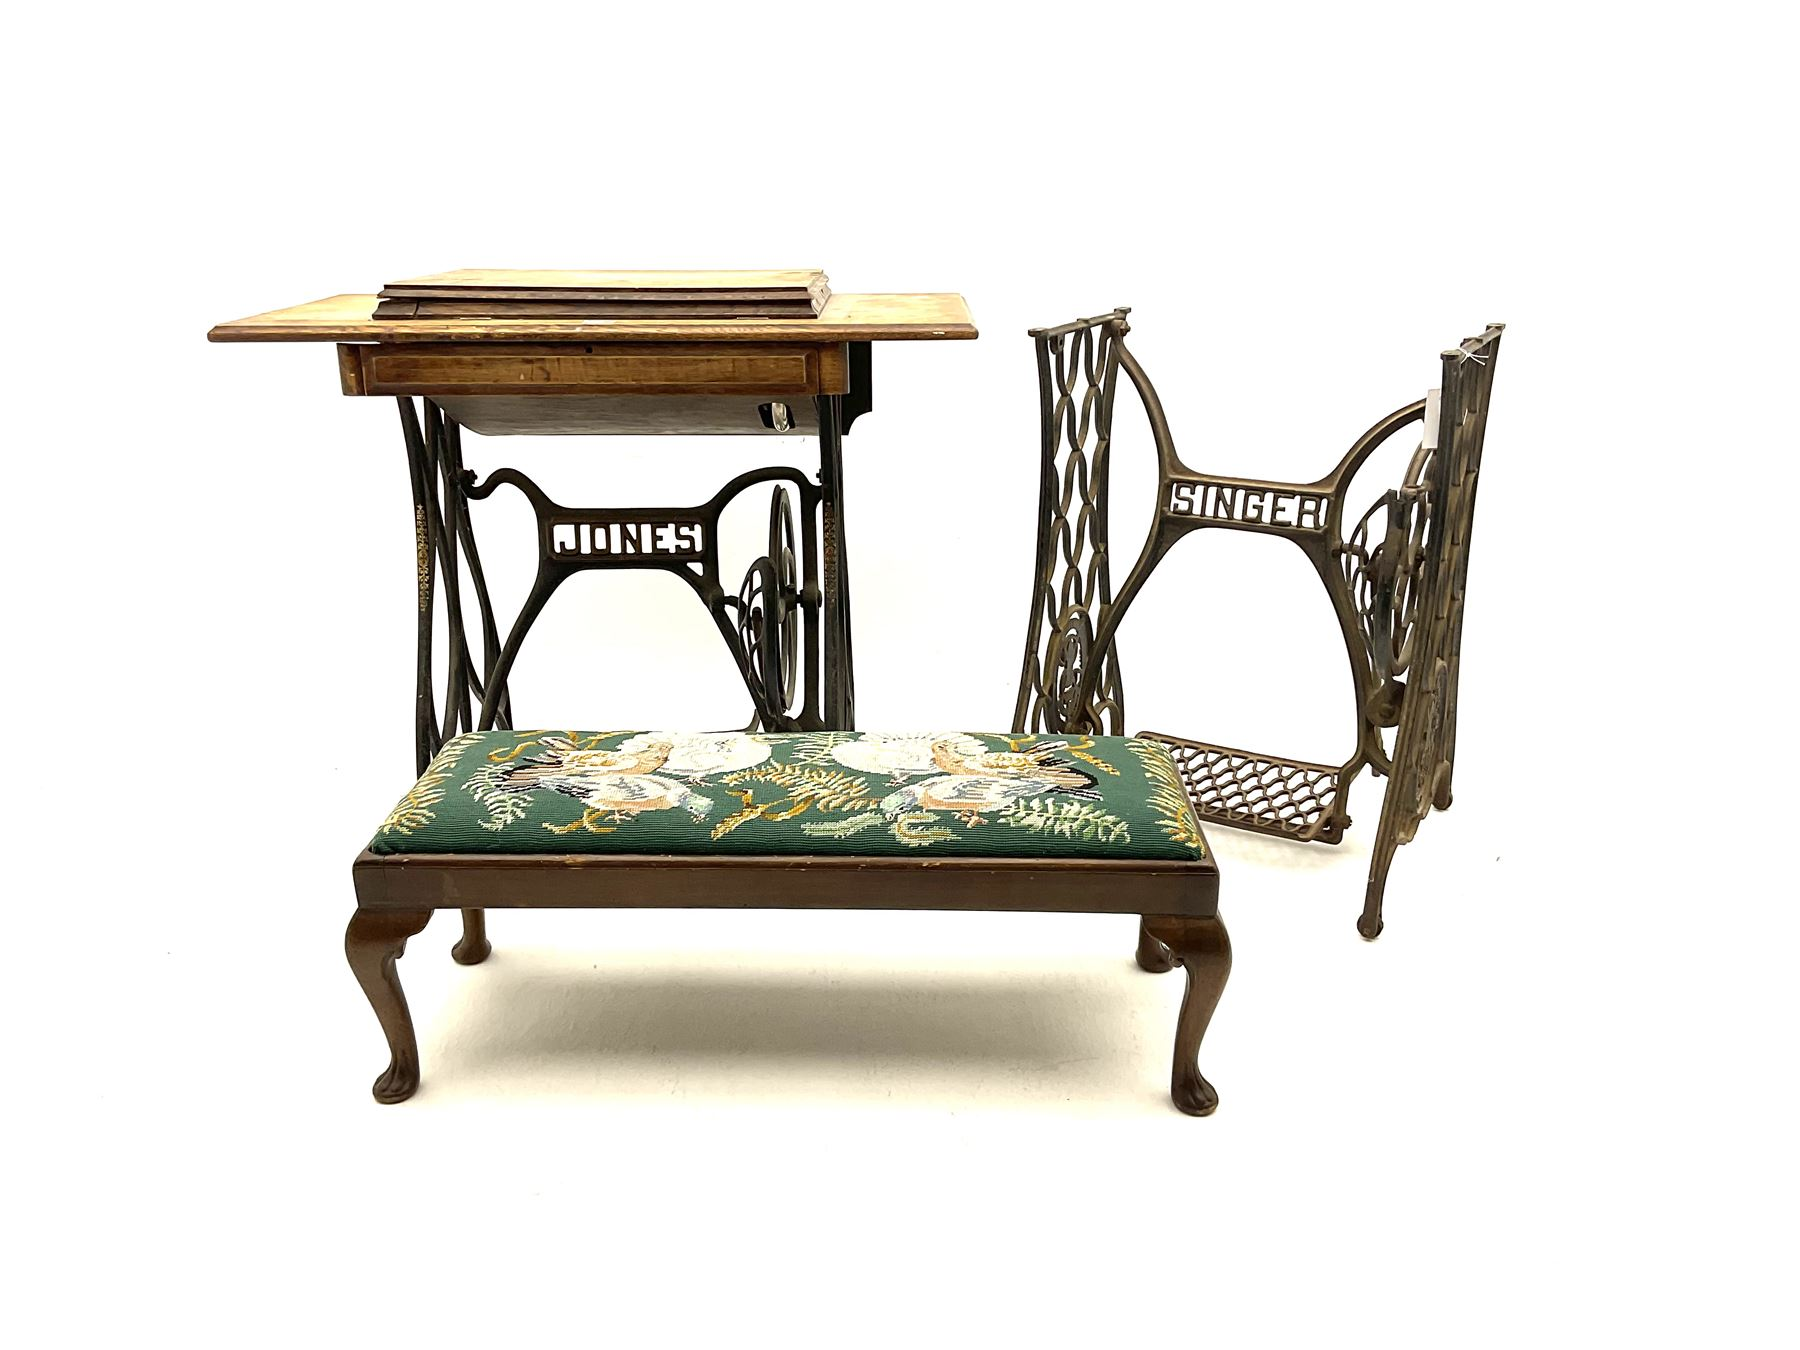 Vintage Jones treadle sewing machine